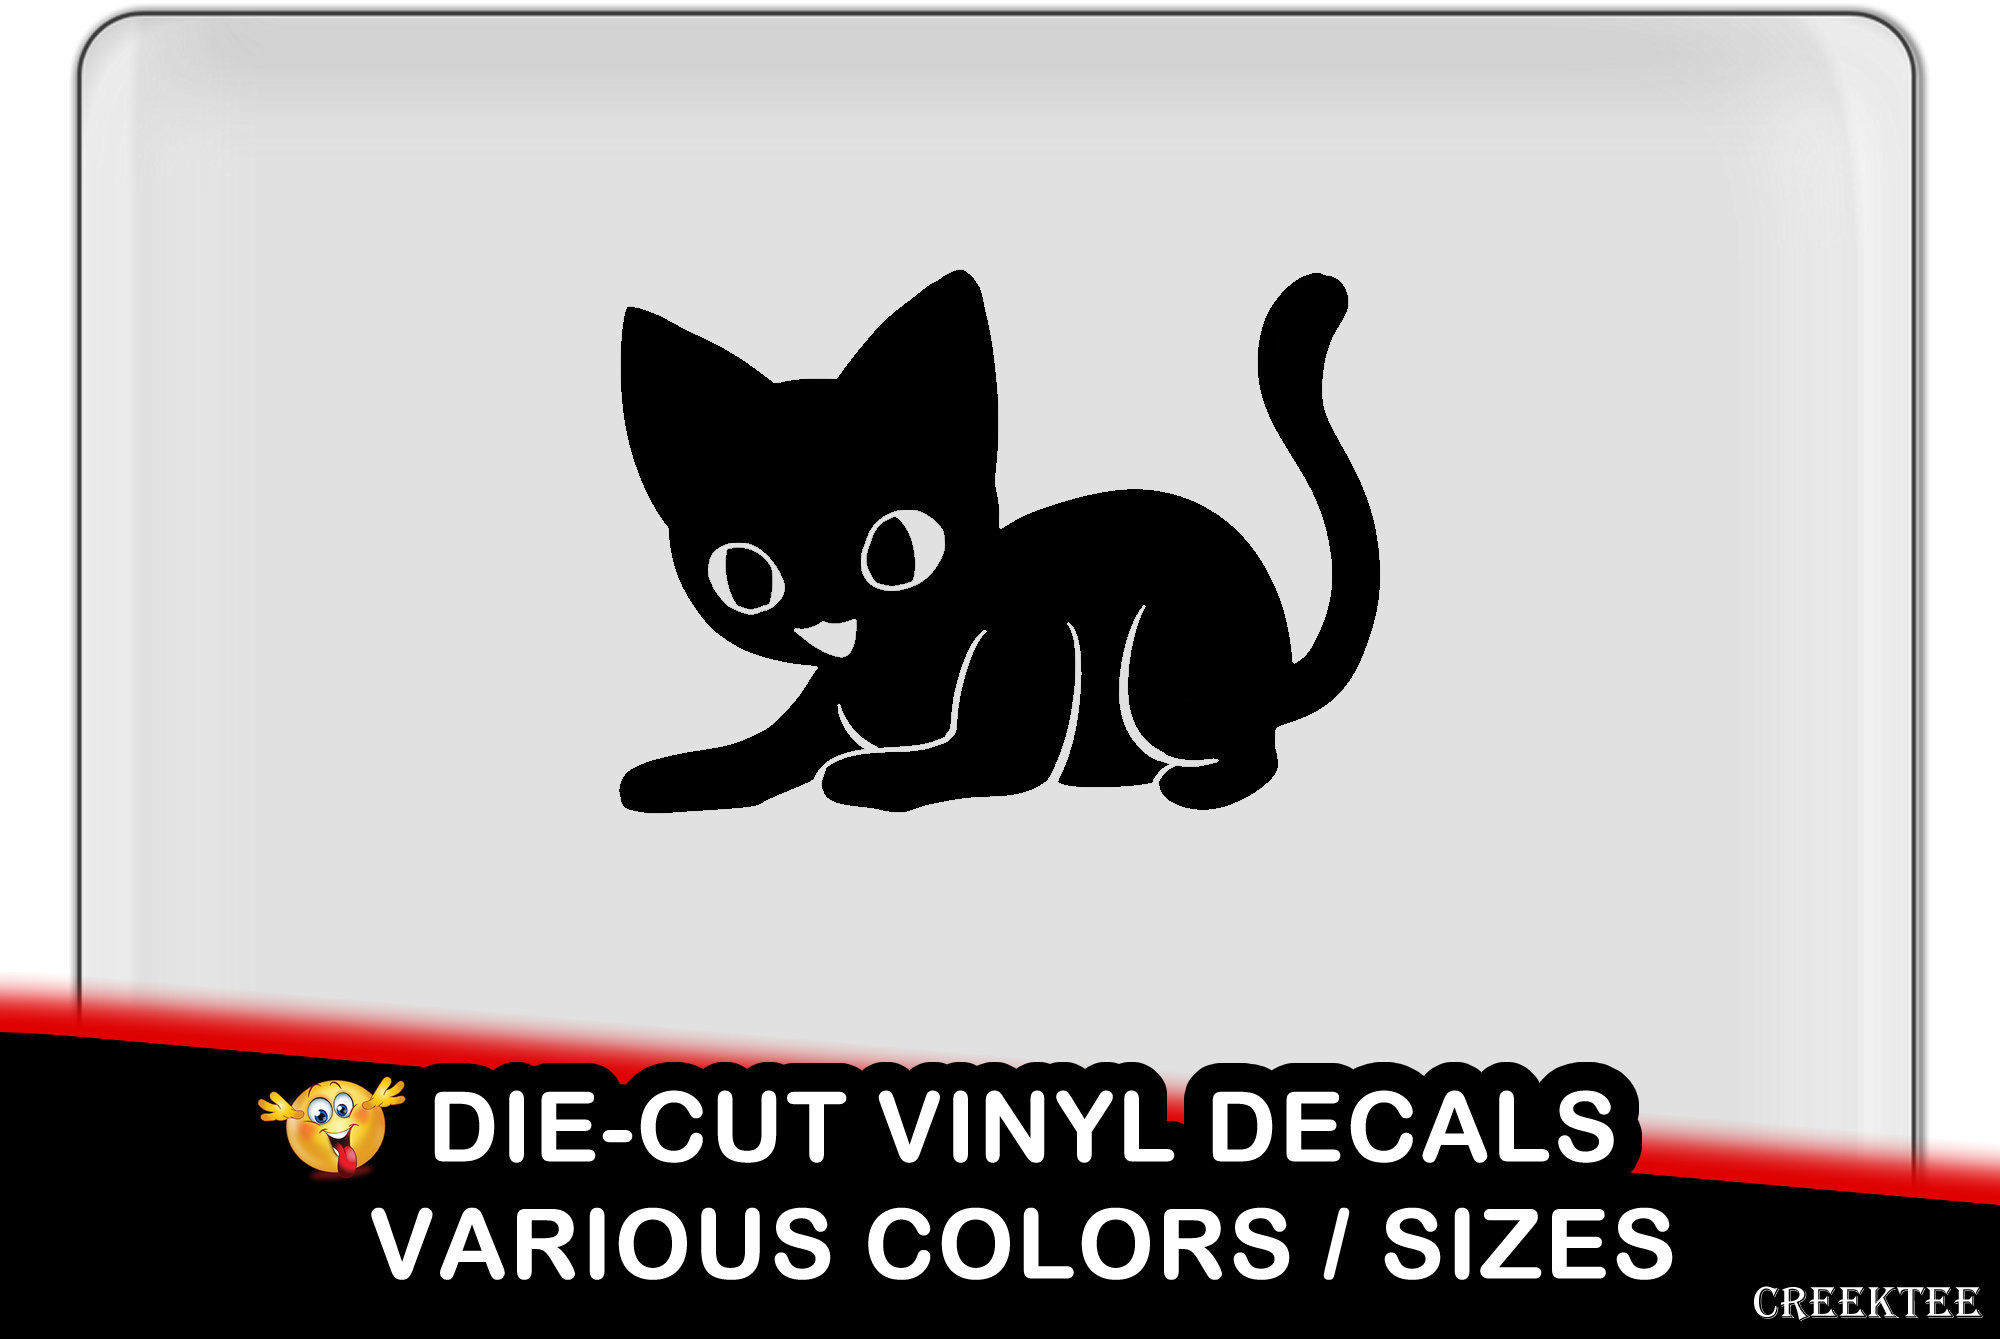 Kitten Cat Vinyl Decal - fun vinyl decal in various colors